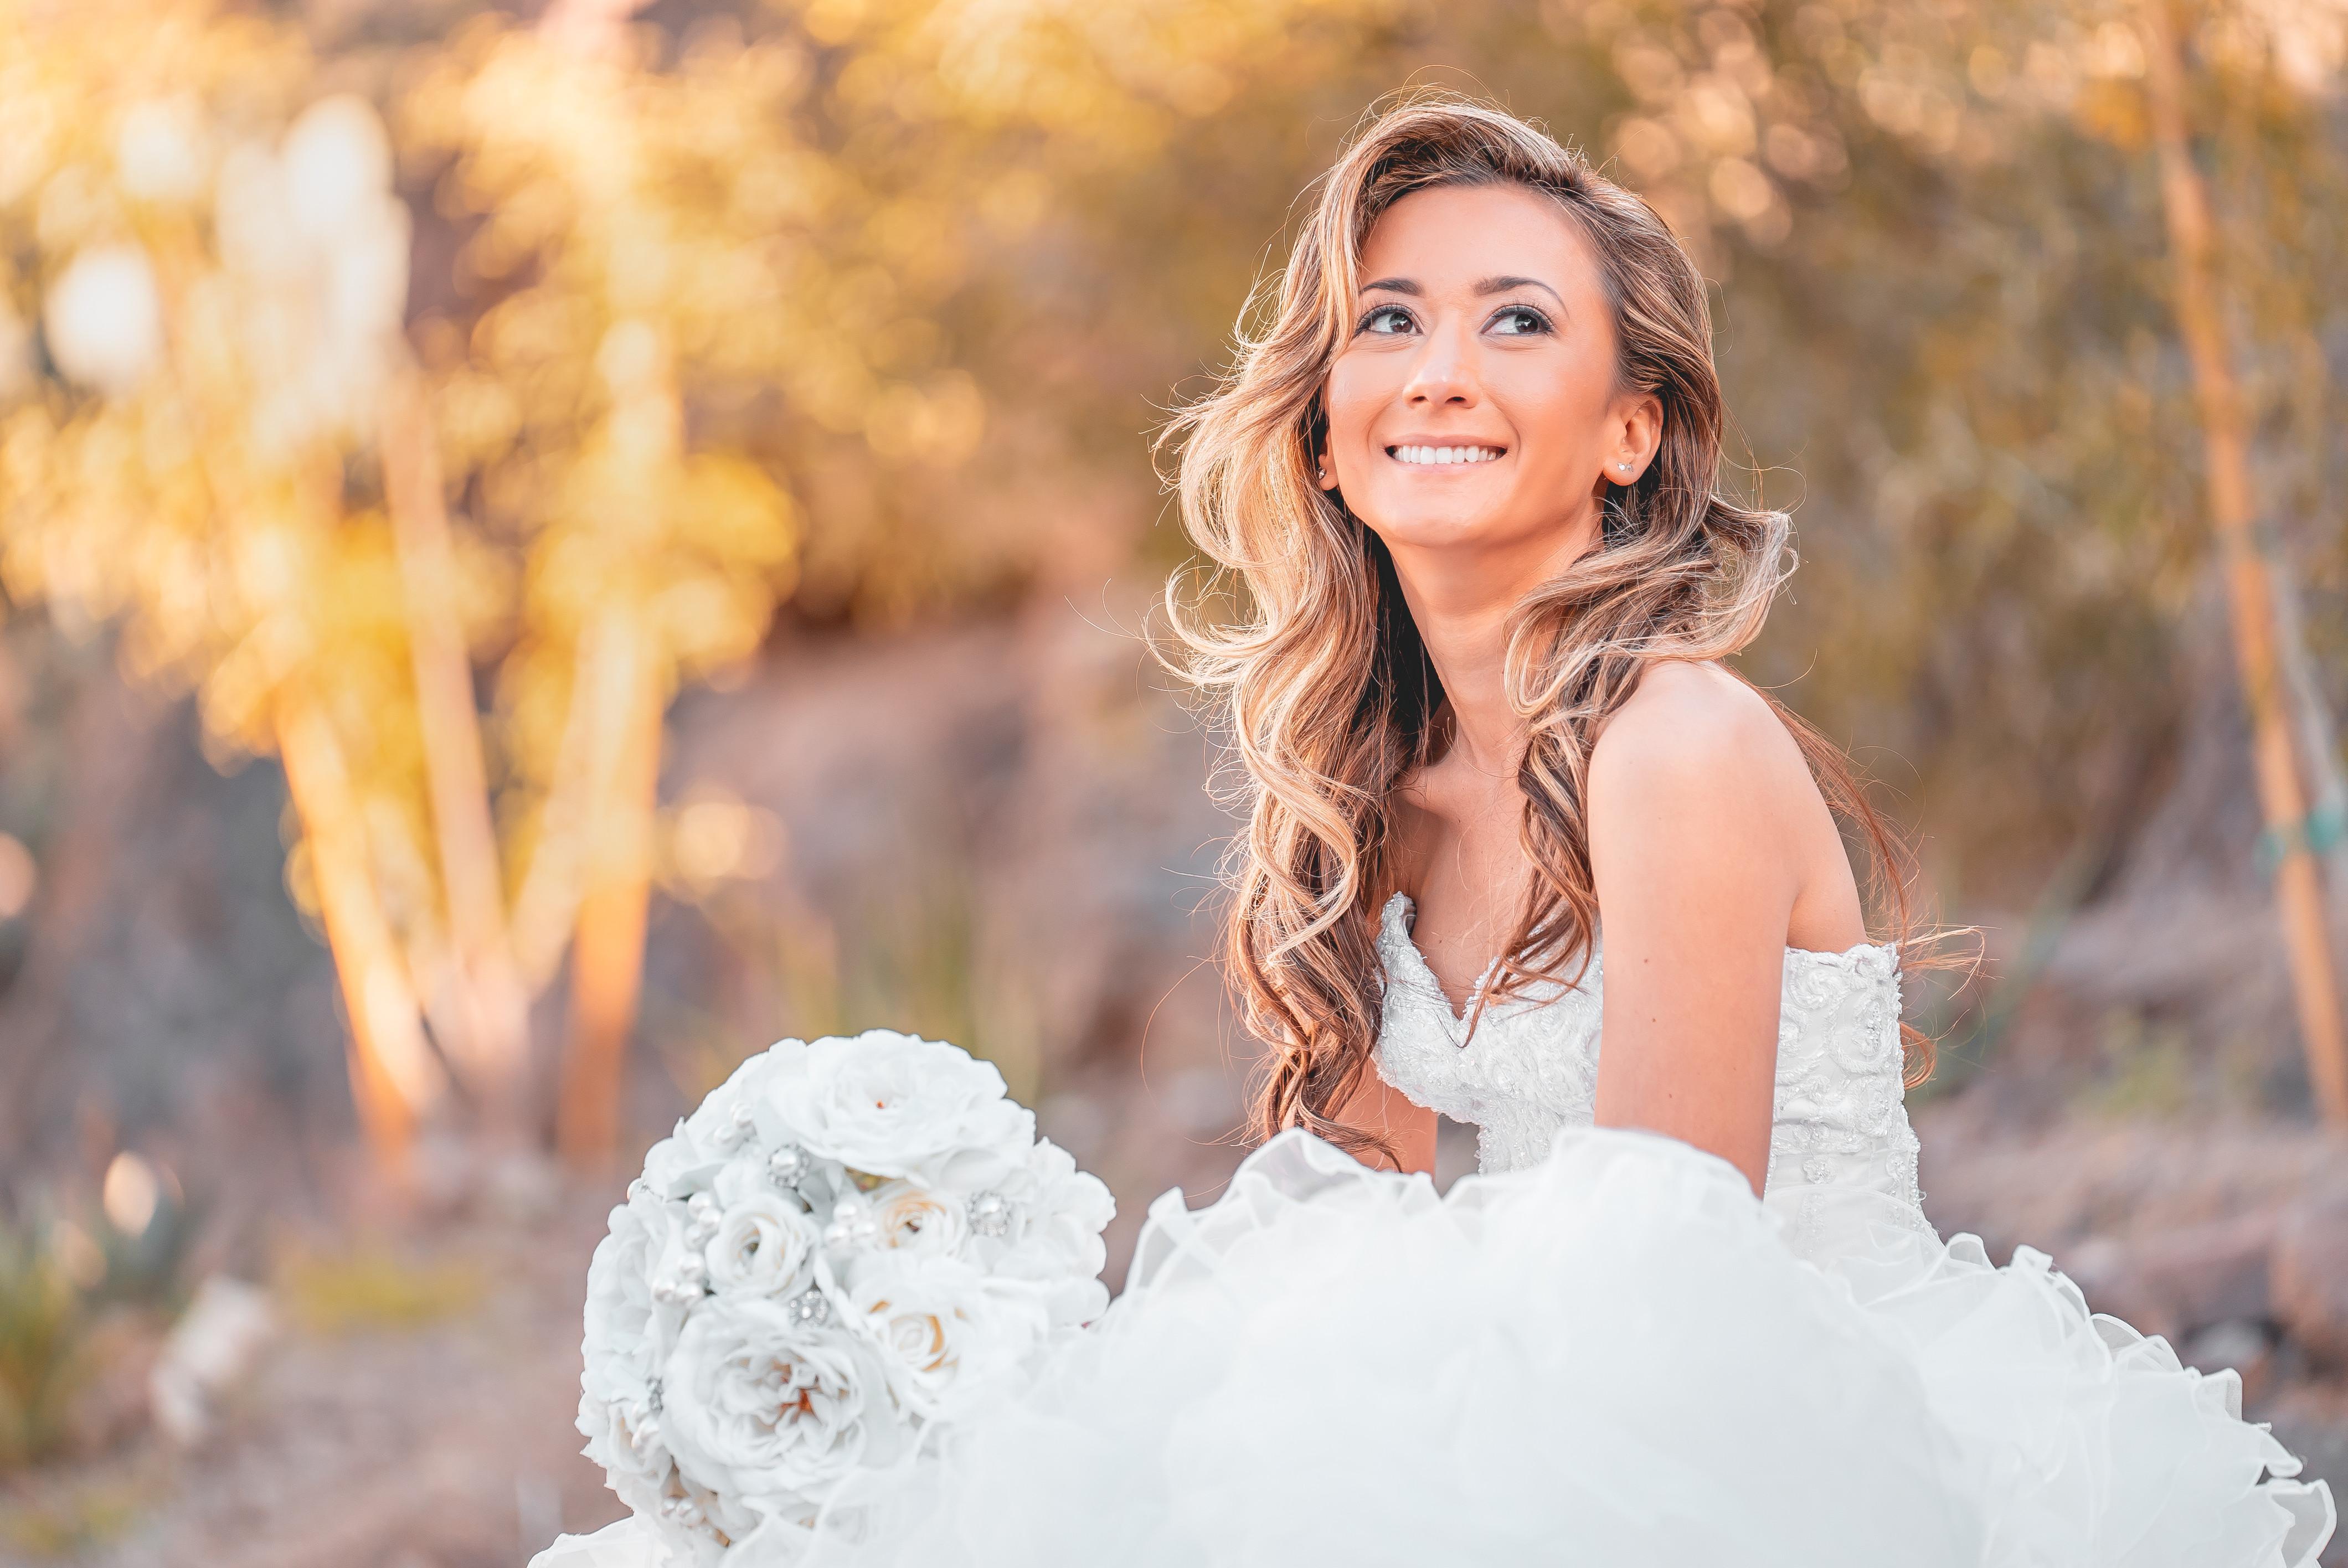 WEDDING PHOTOGRAPHY | Half Day